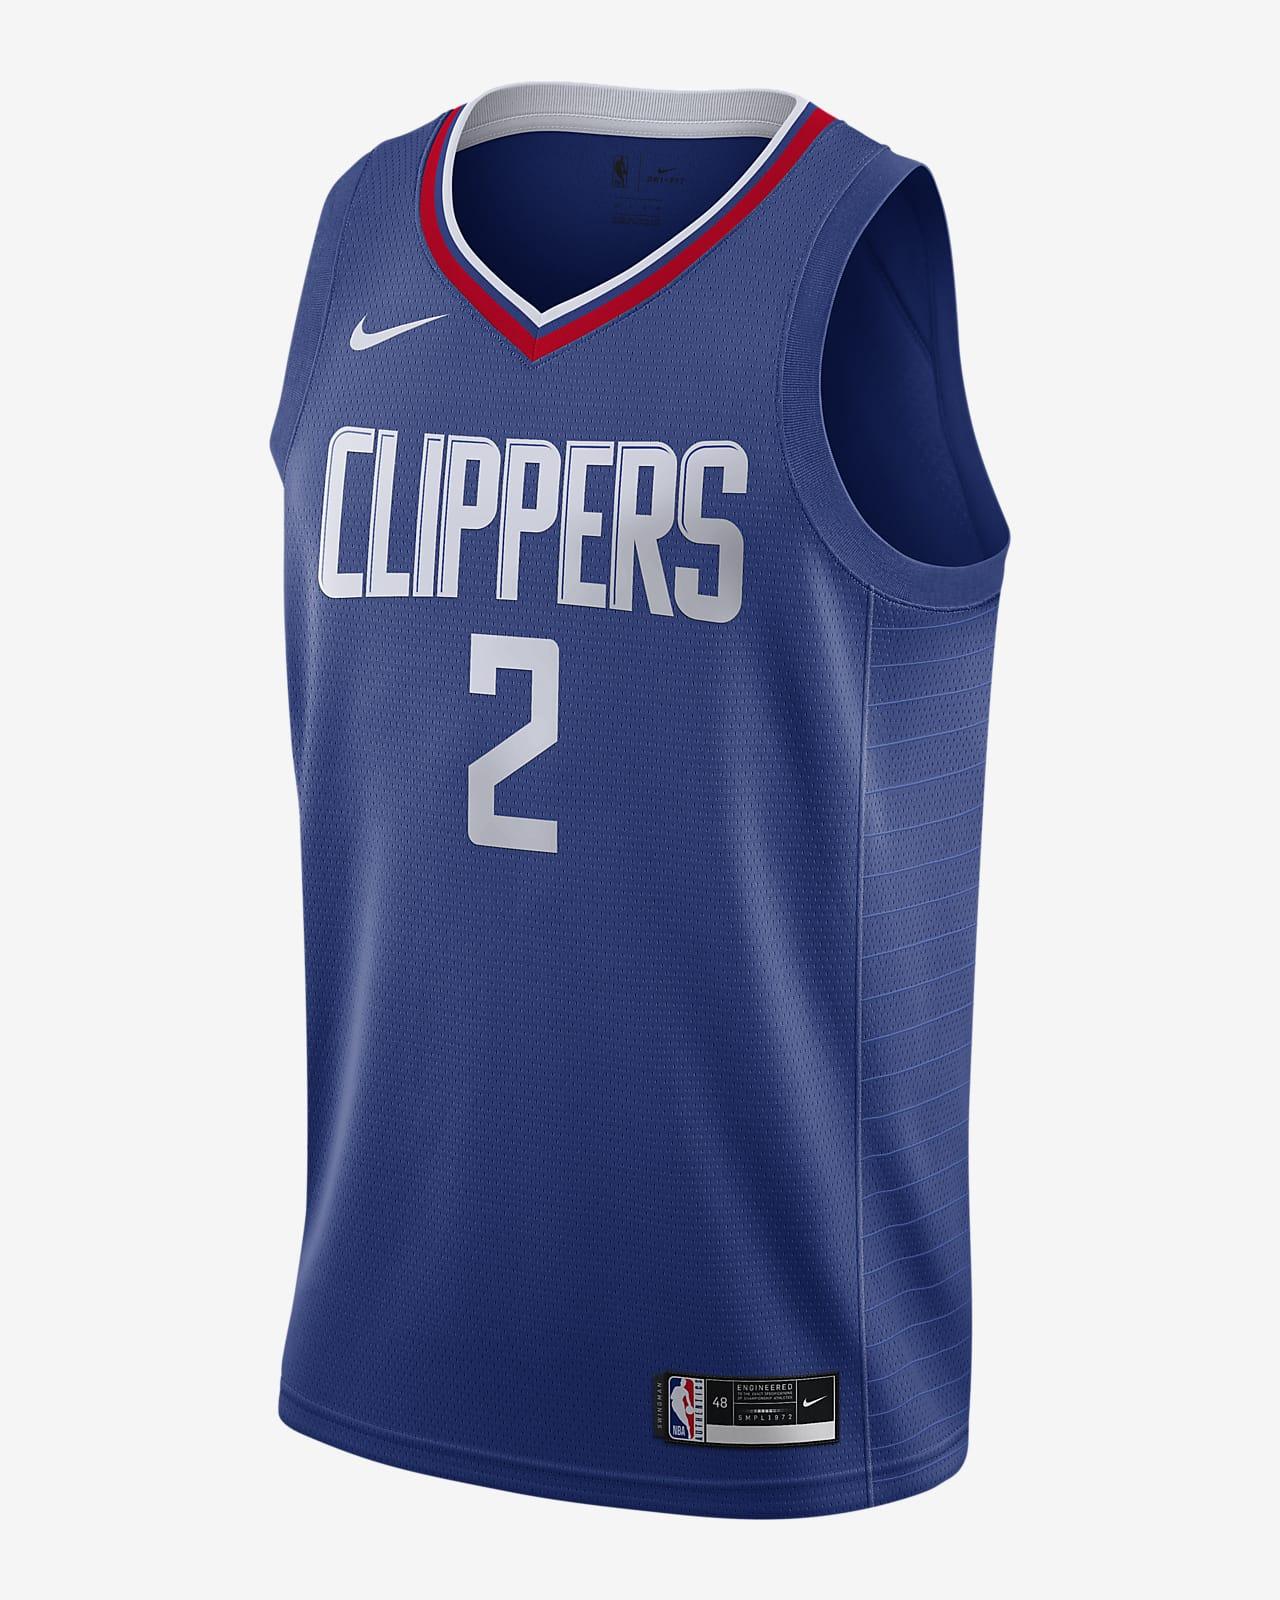 Джерси Nike НБА Swingman Kawhi Leonard Clippers Icon Edition 2020